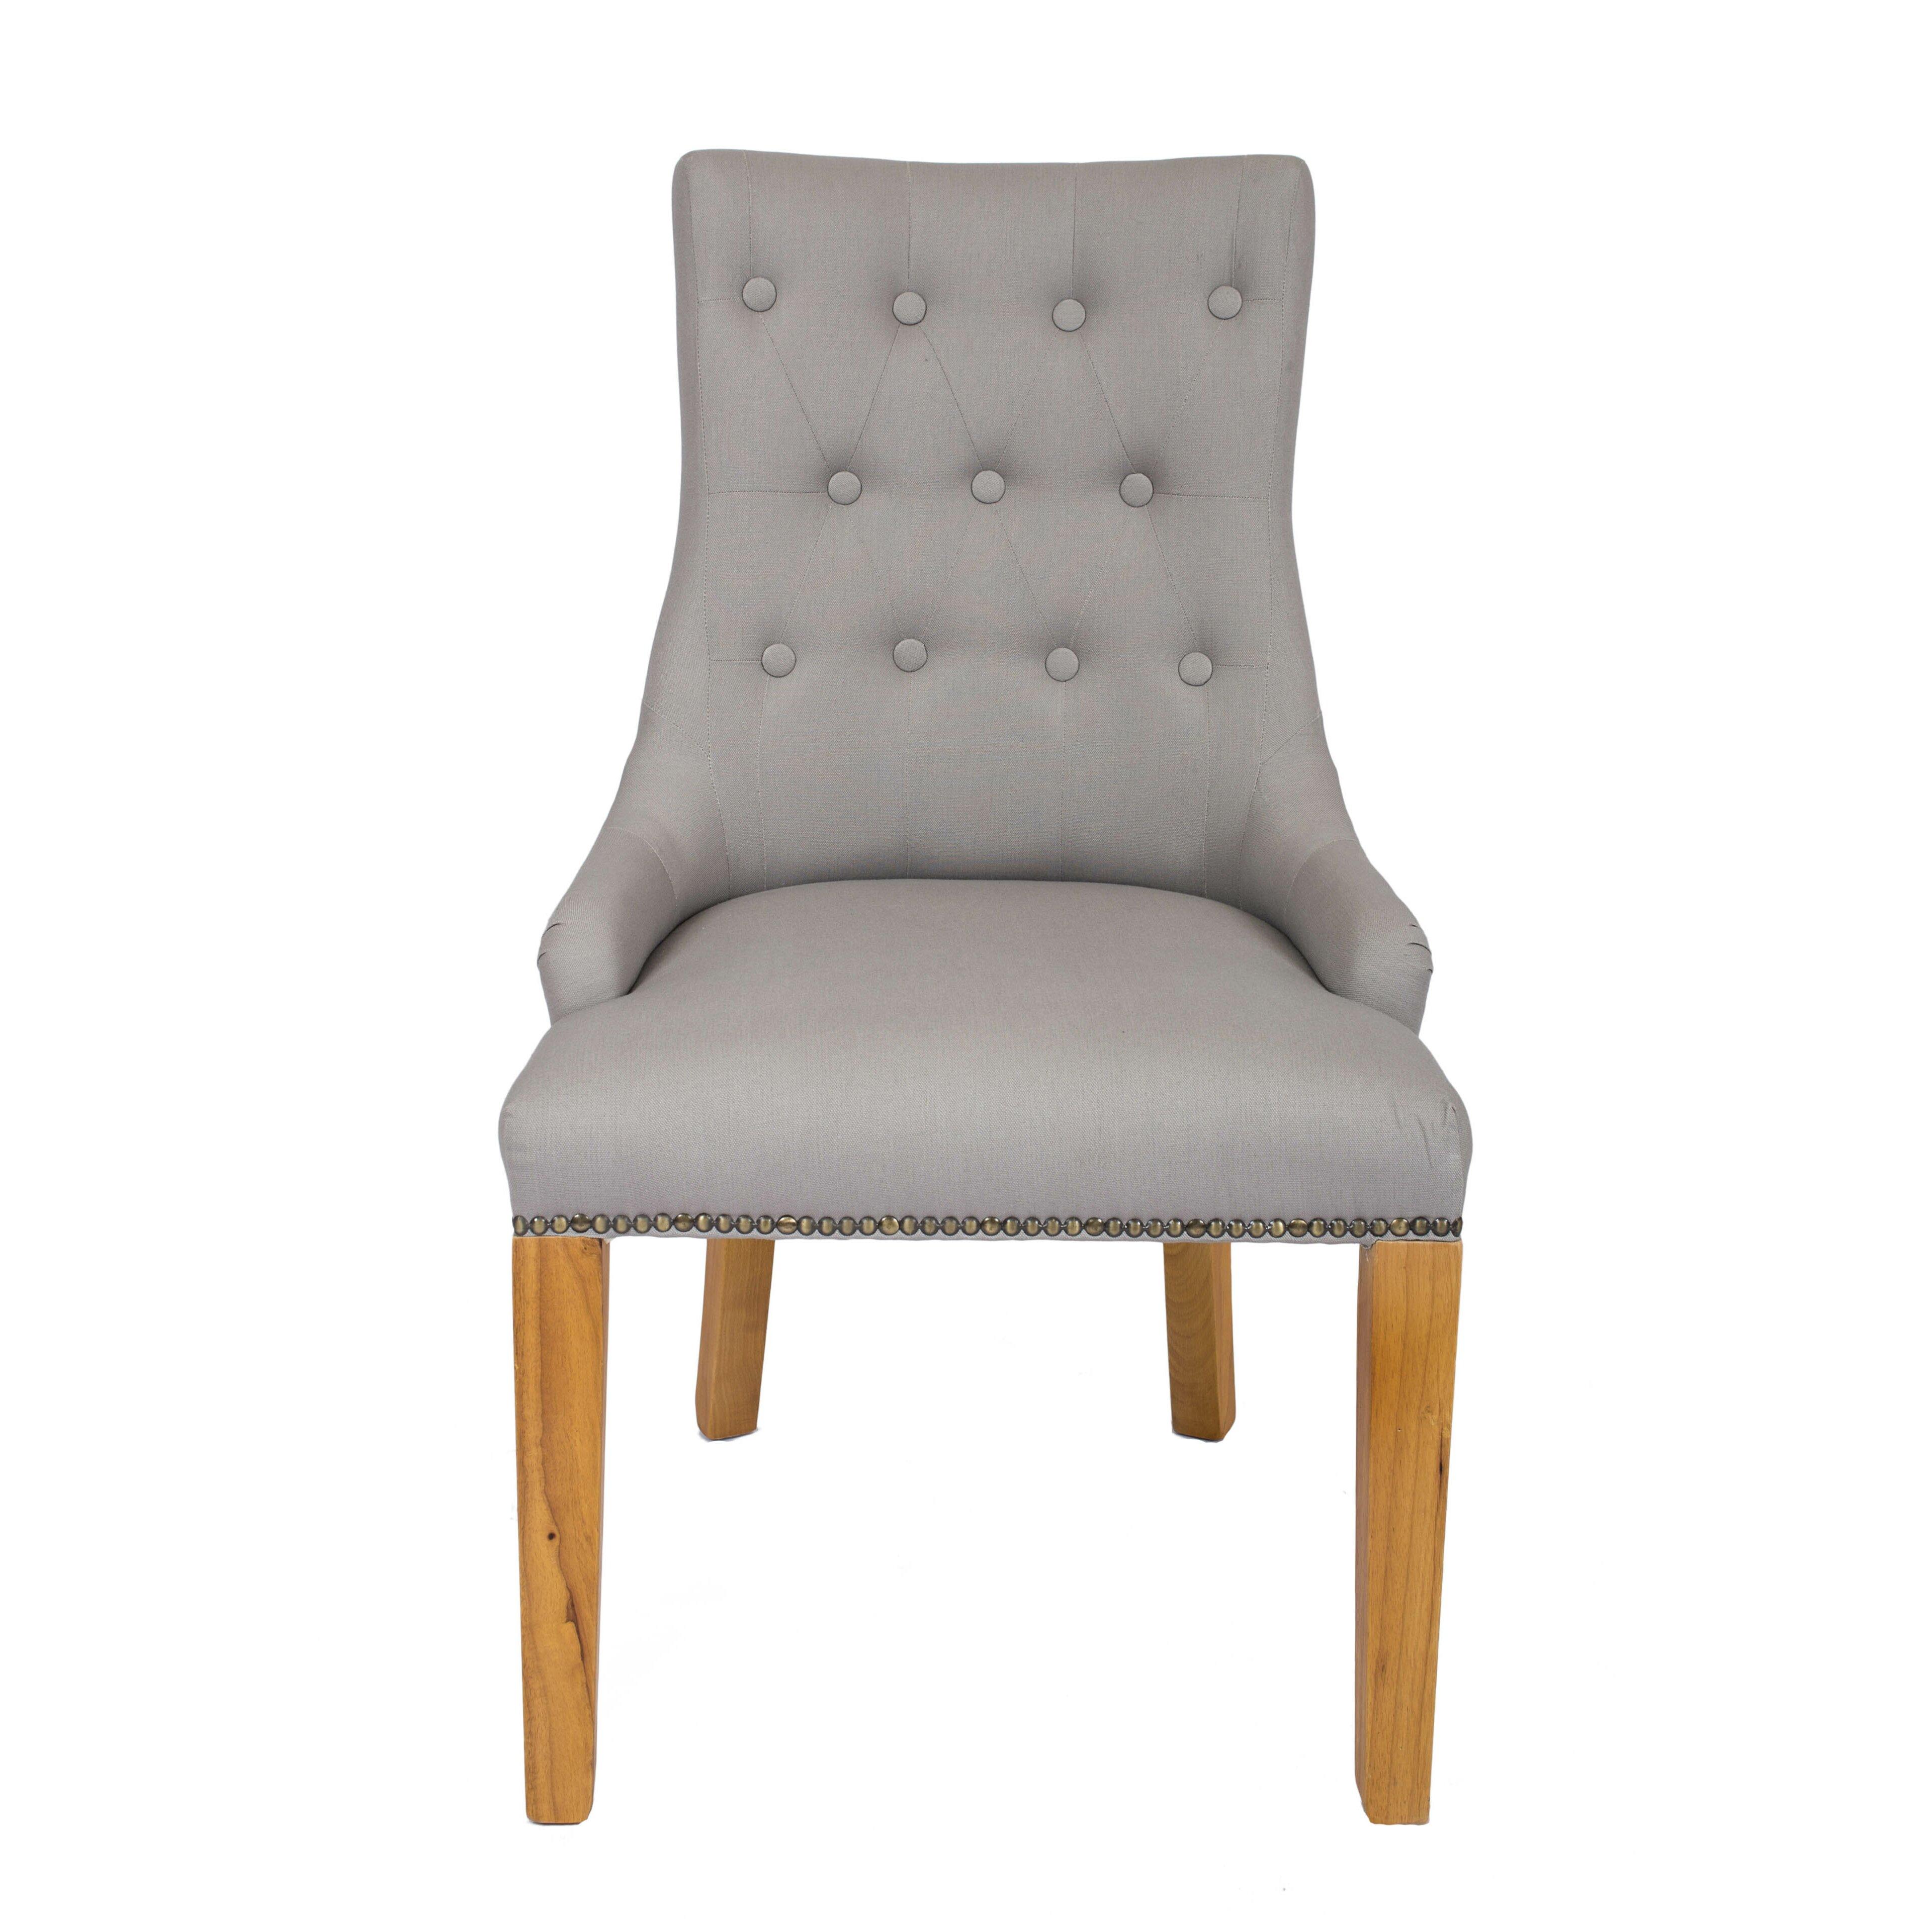 Derrys Solid Wood Dining Chair Wayfair UK : Lion Knocker Dining Chair YI789 O from www.wayfair.co.uk size 3842 x 3842 jpeg 782kB